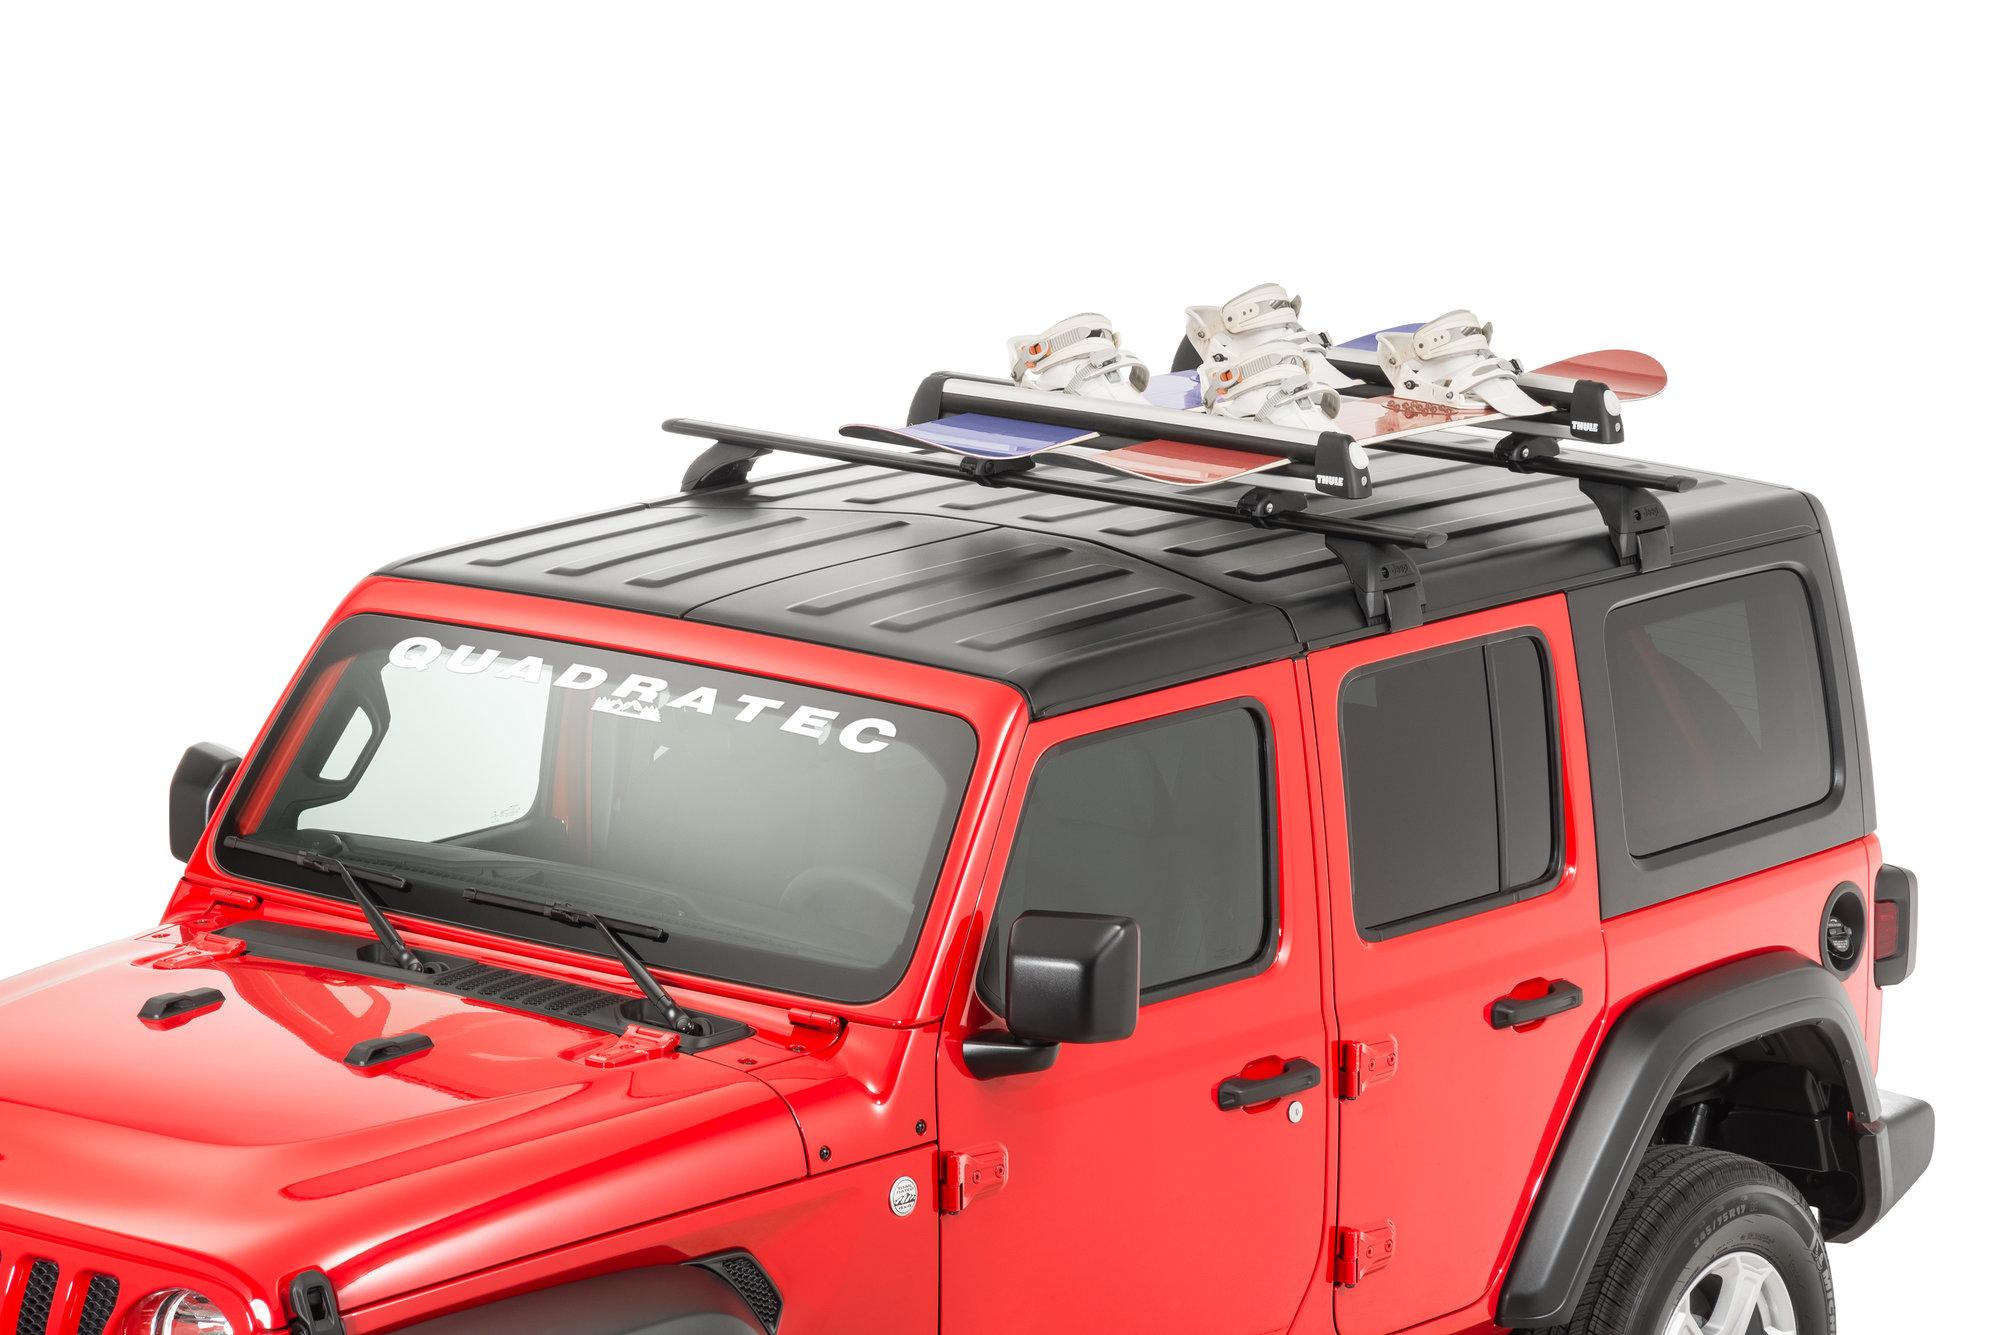 mopar flat top ski and snowboard carrier